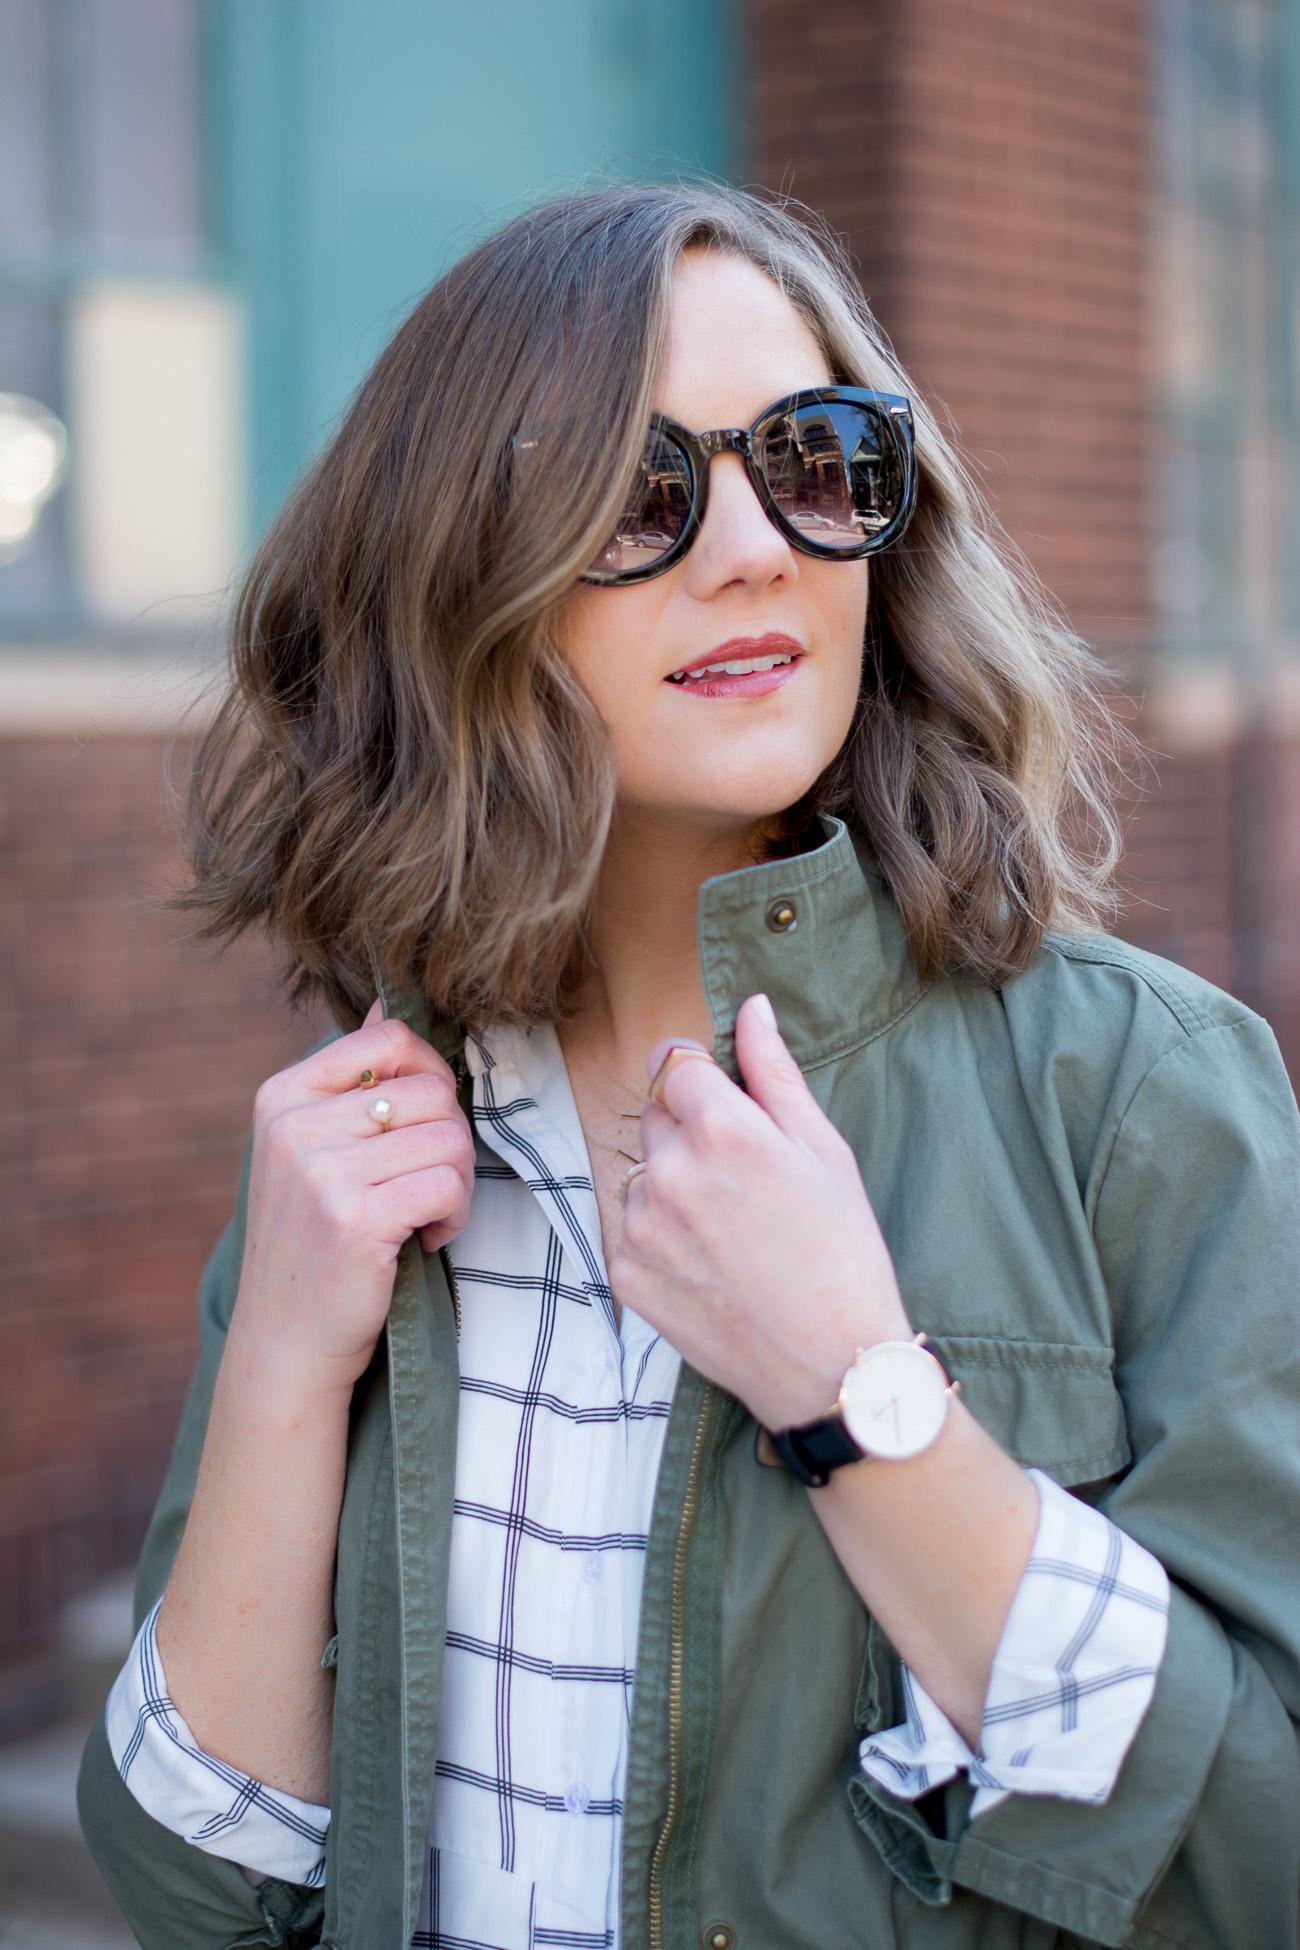 cargo-jacket-black-and-white-grid-print-shirtdress-delicate-jewelry-designer-dupe-round-sunglasses